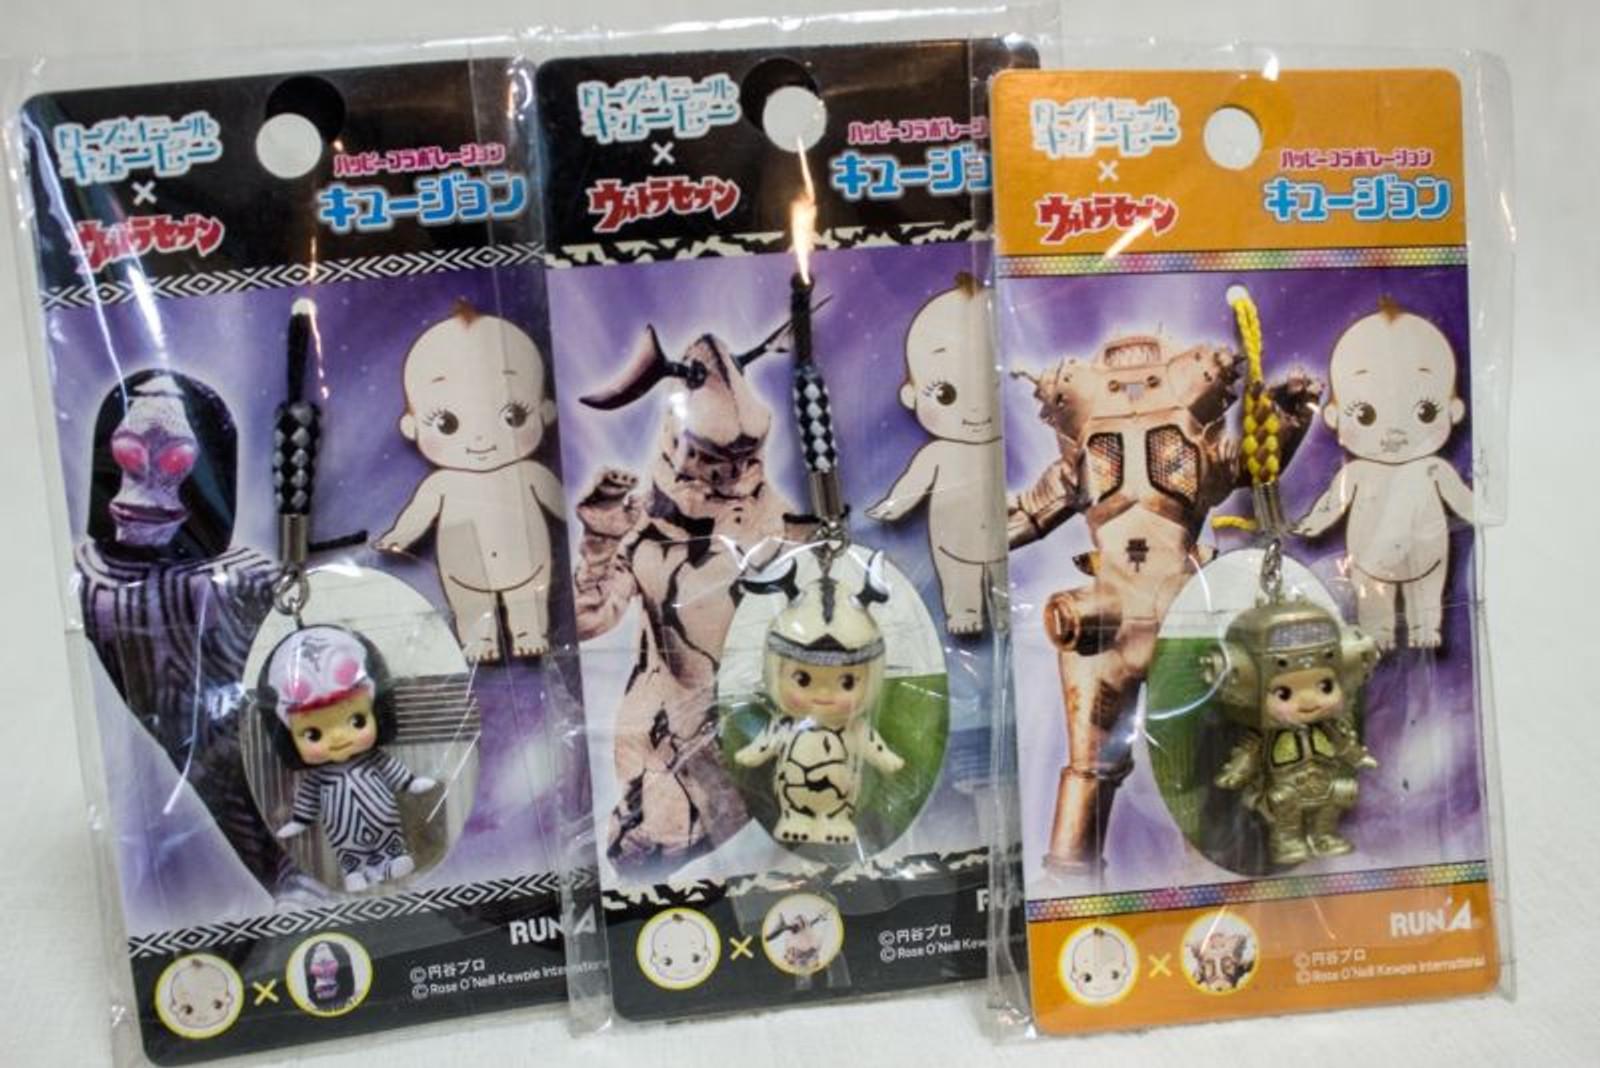 Set of 3 Ultraman Alien Rose O'neill Kewpie Kewsion Strap JAPAN ANIME